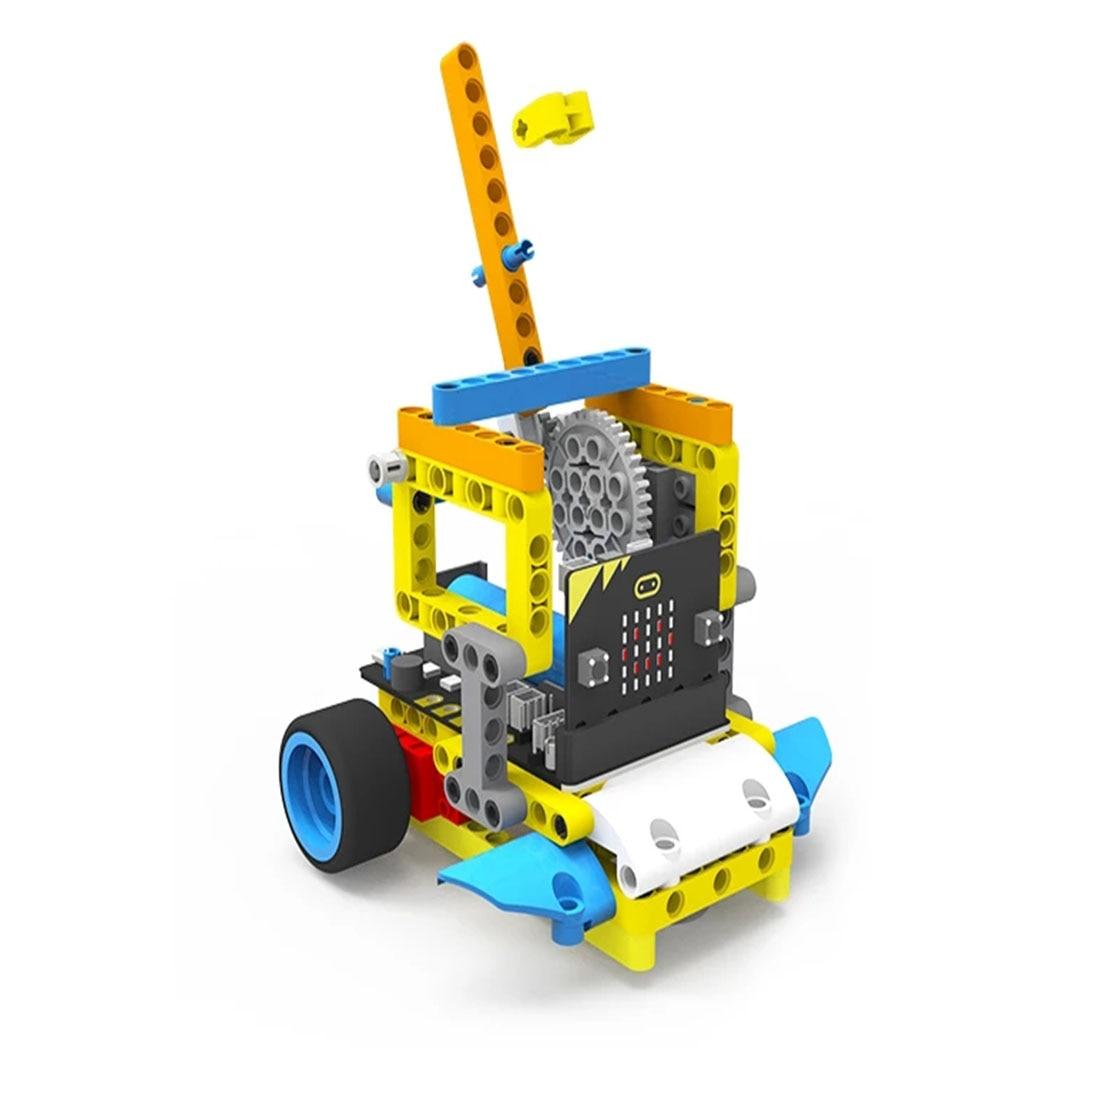 Program Intelligent Robot Building Block Car Kit Various Shapes Steam Programming Education Car For Micro:Bit(Including Or Not )